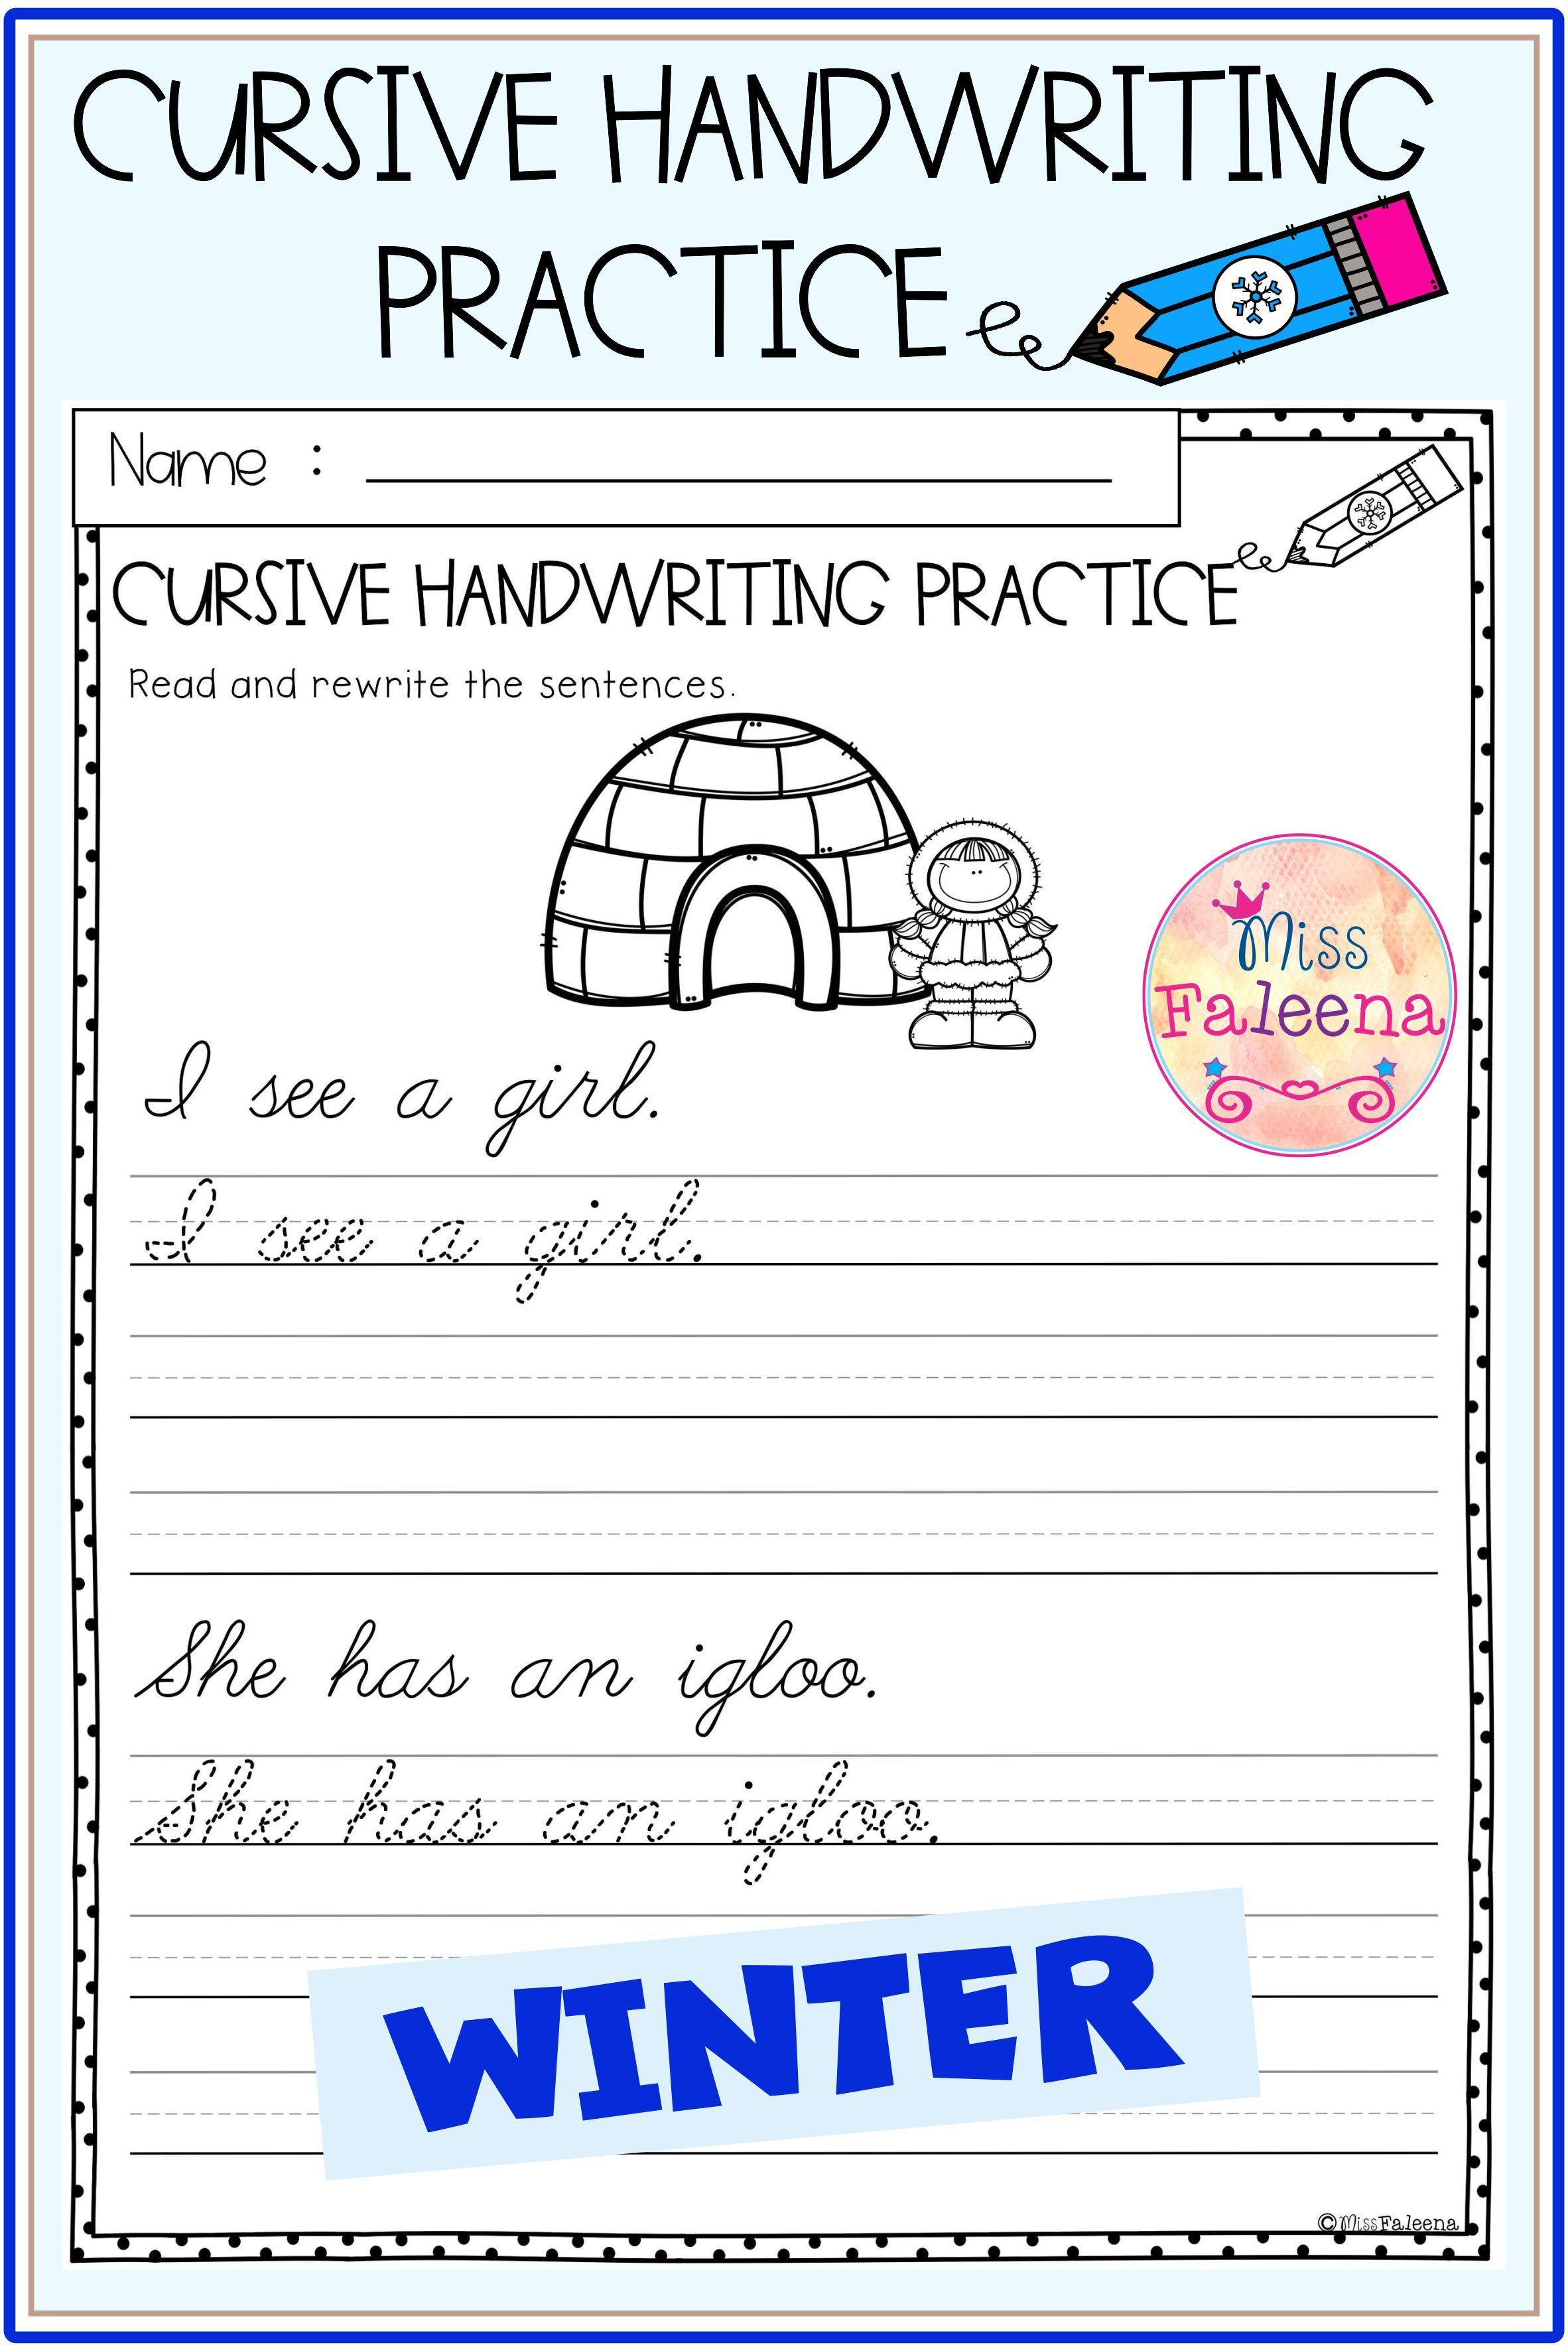 Winter Cursive Handwriting Practice Cursive Handwriting Practice Handwriting Practice Cursive Handwriting [ 3544 x 2364 Pixel ]